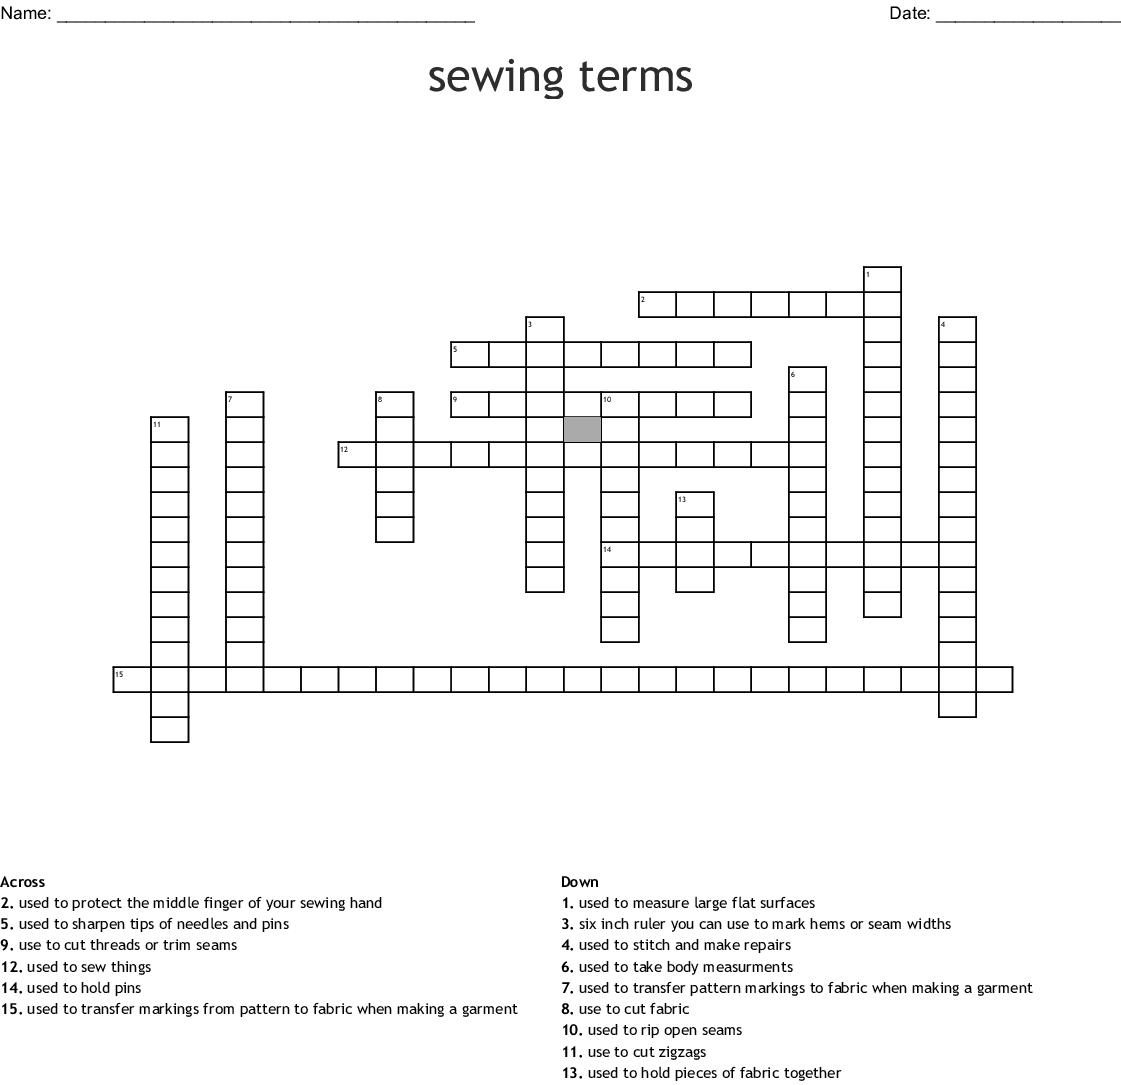 Sewing Pattern Symbols Worksheet Answers